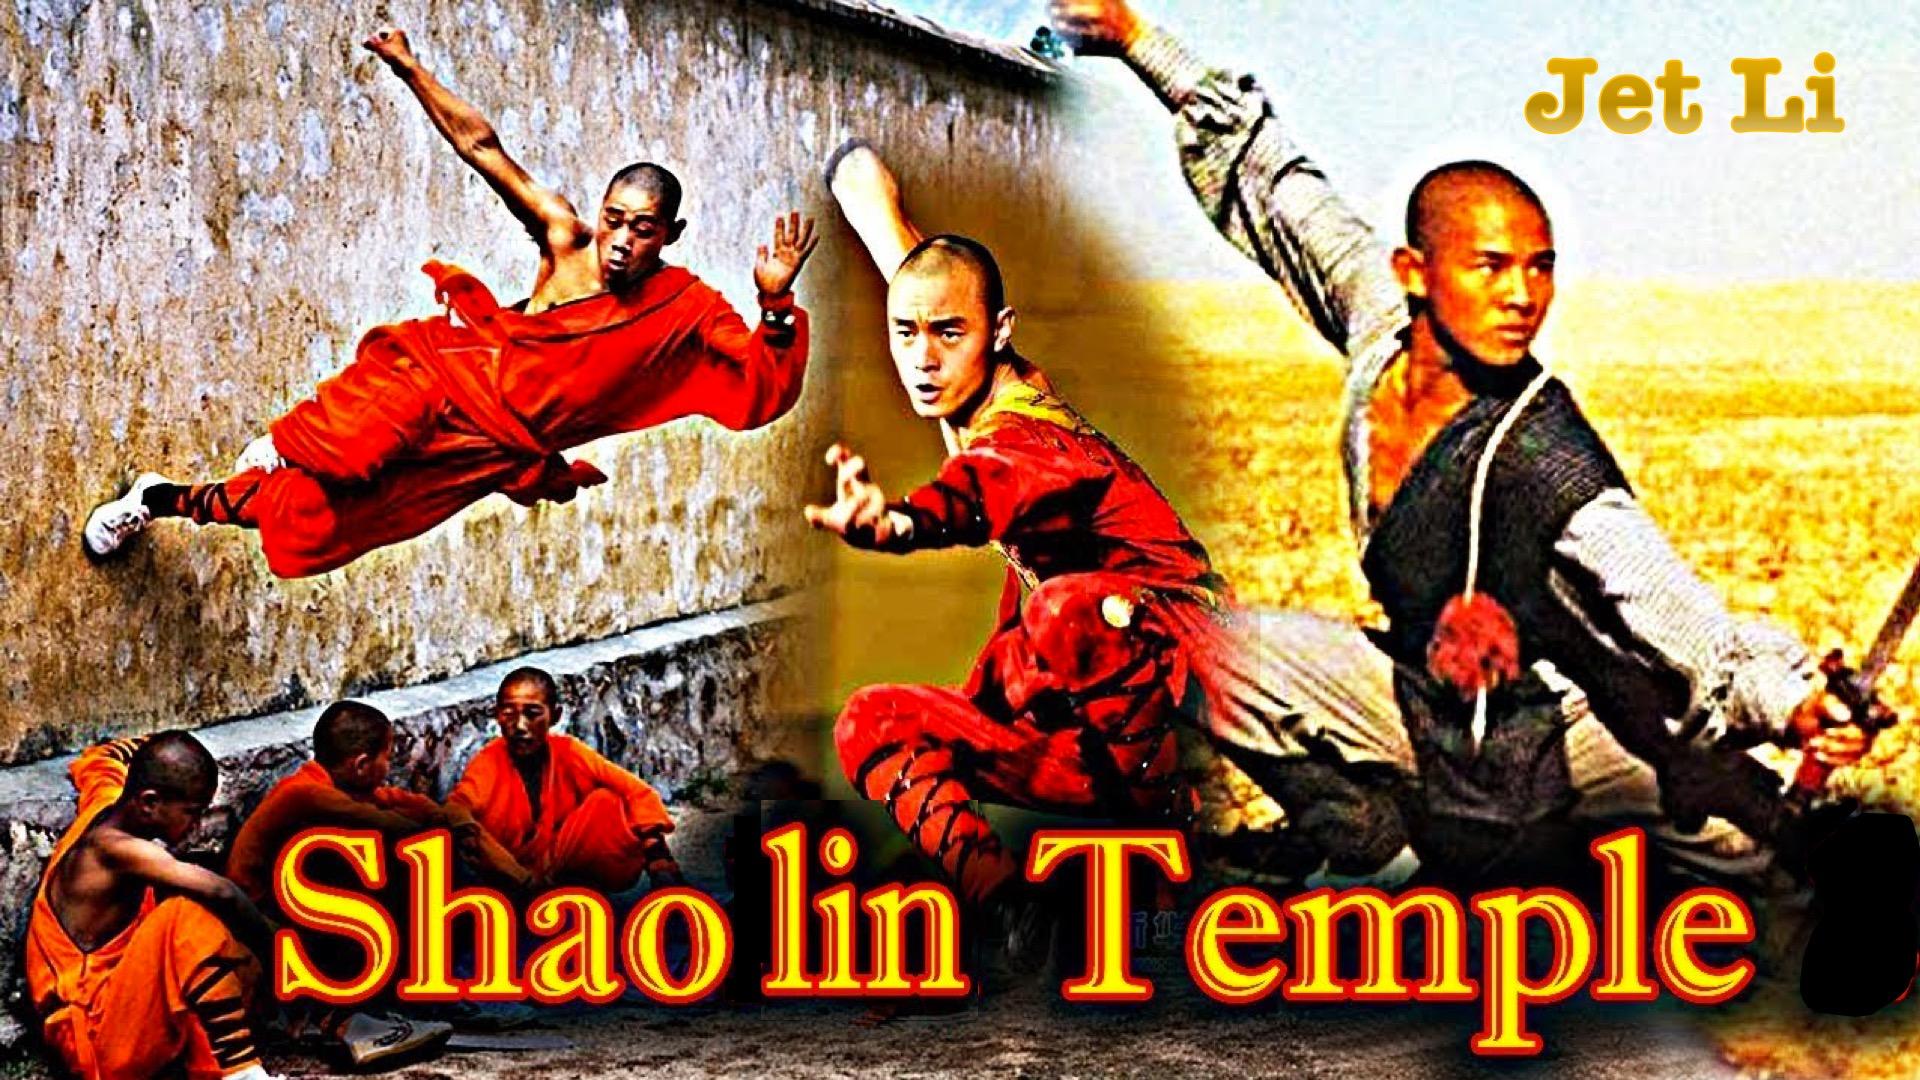 Shao Lin Temple